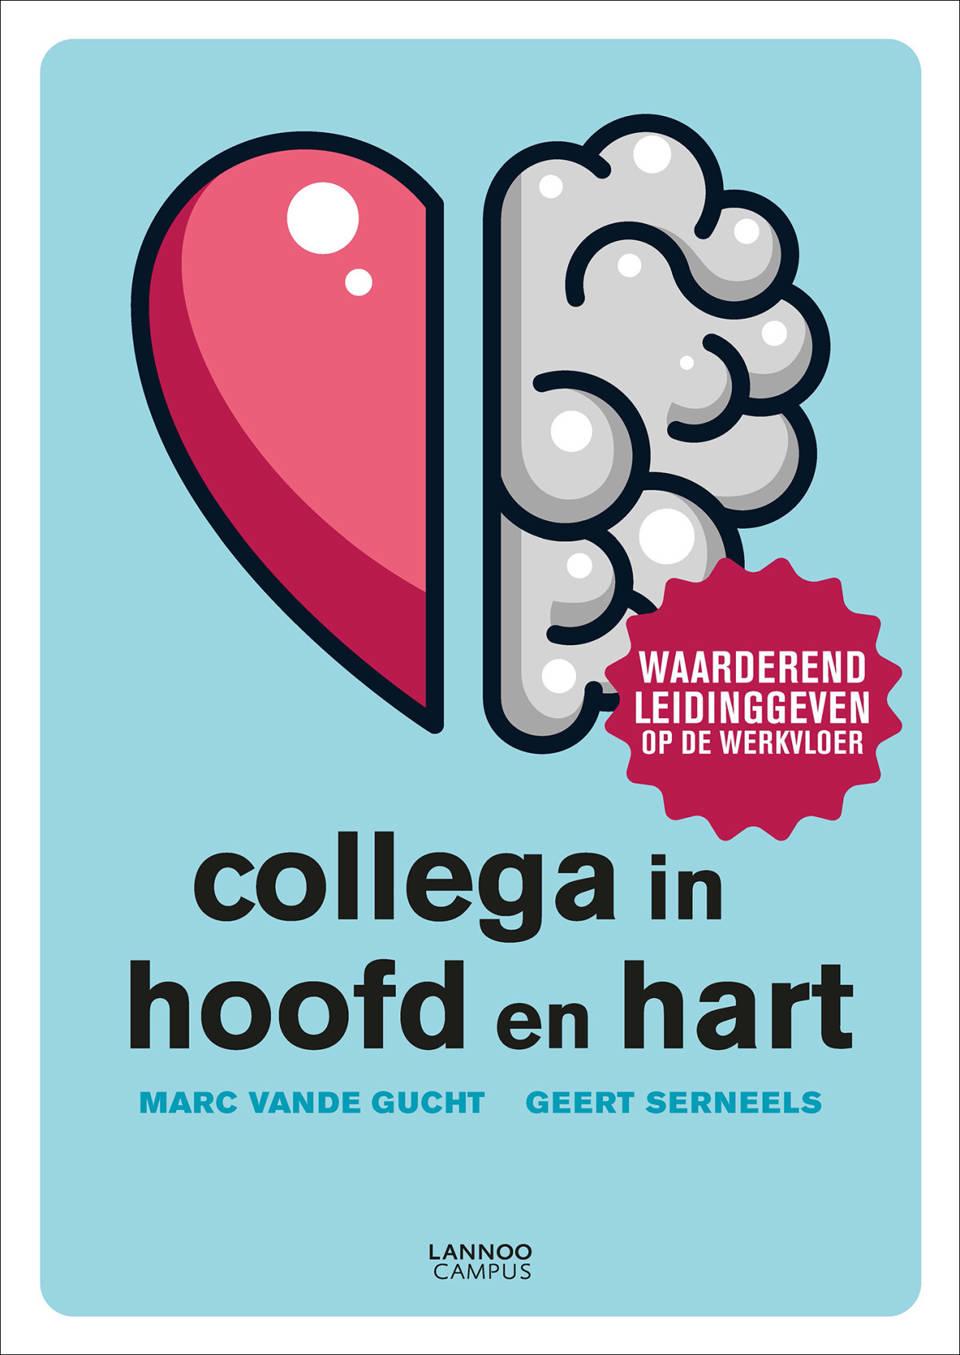 Collega in hoofd en hart | Marc vande Gucht, Geert Serneels | 9789401469999  | Standaard Boekhandel